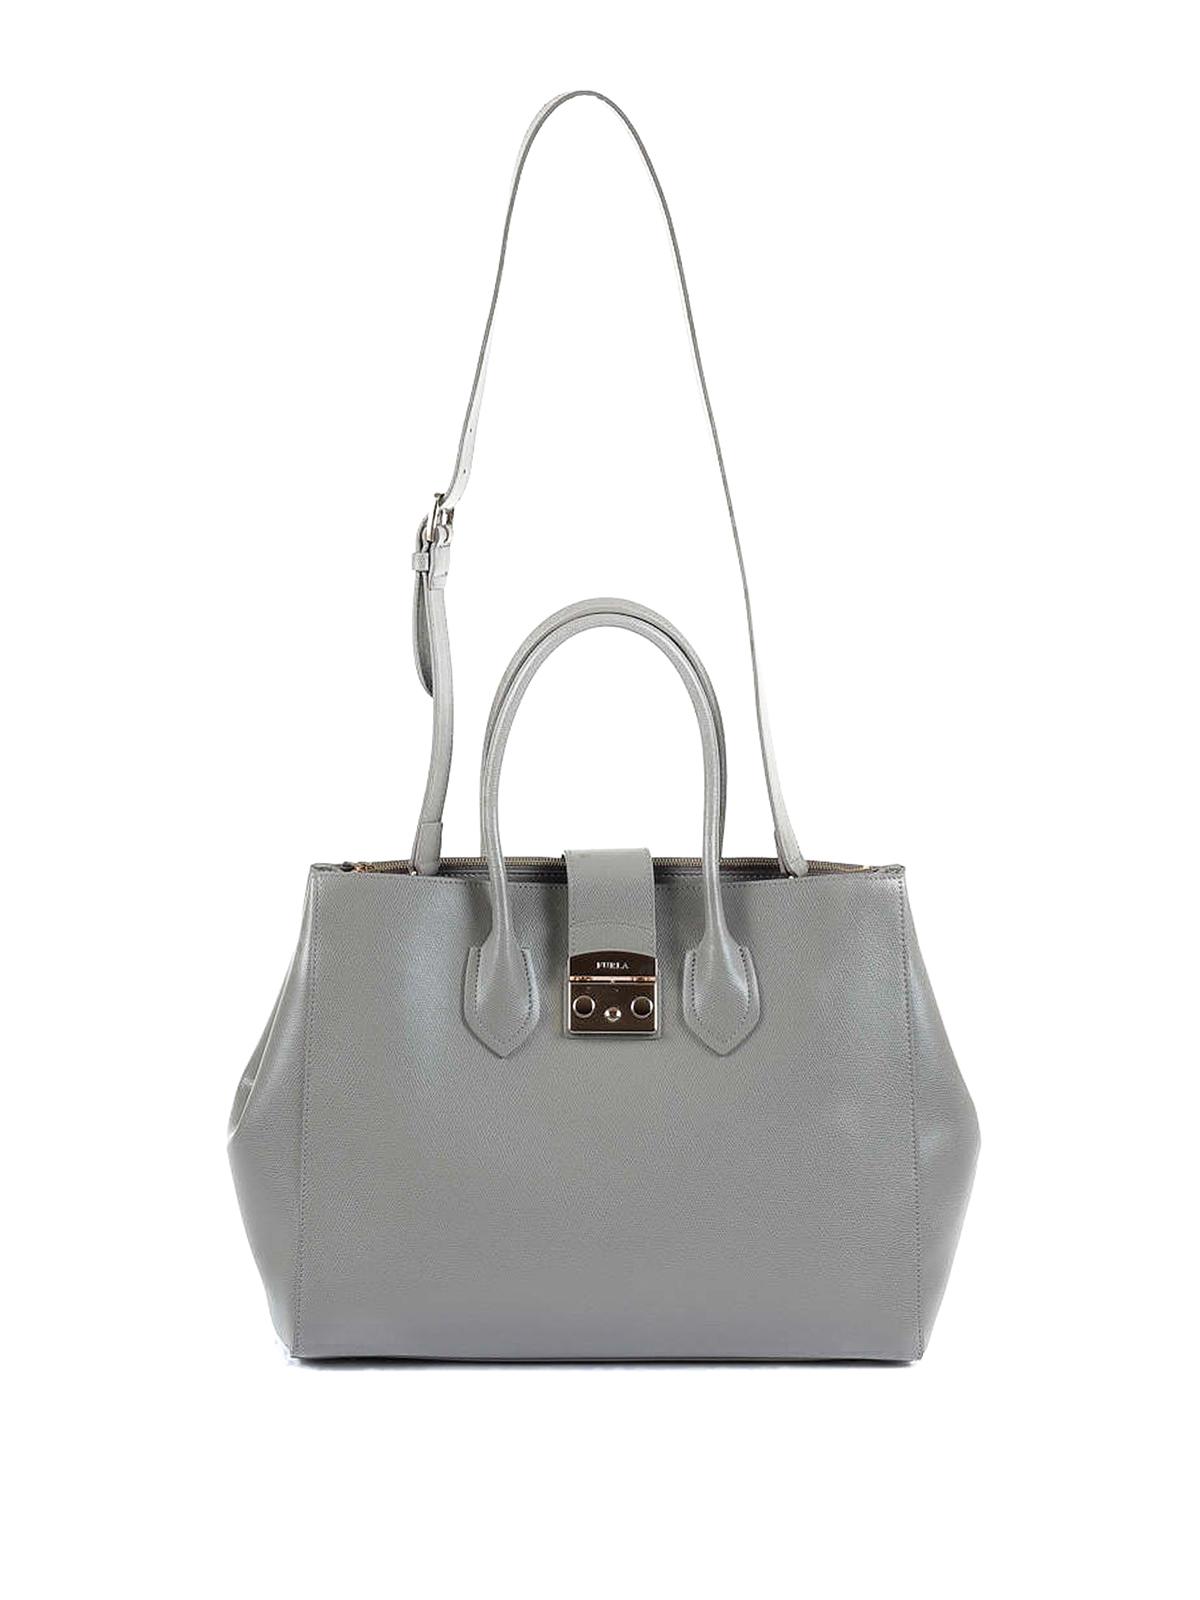 561bfc5ca Furla - Metropolis XL grey leather tote - totes bags - 908115 ...